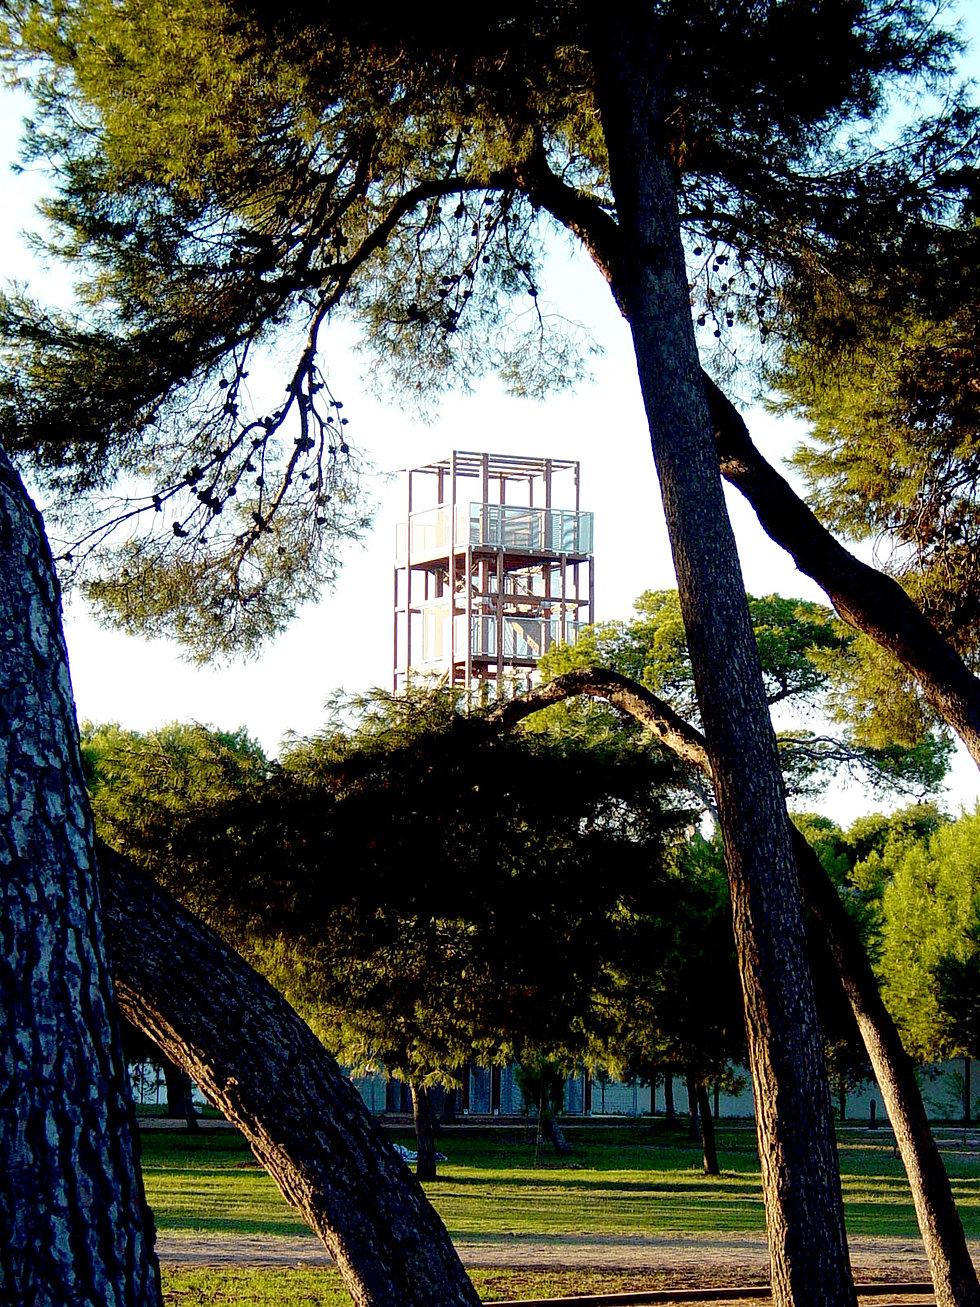 Mf arquitectos pozuelo comunidad de madrid - Arquitectos madrid 2 0 ...